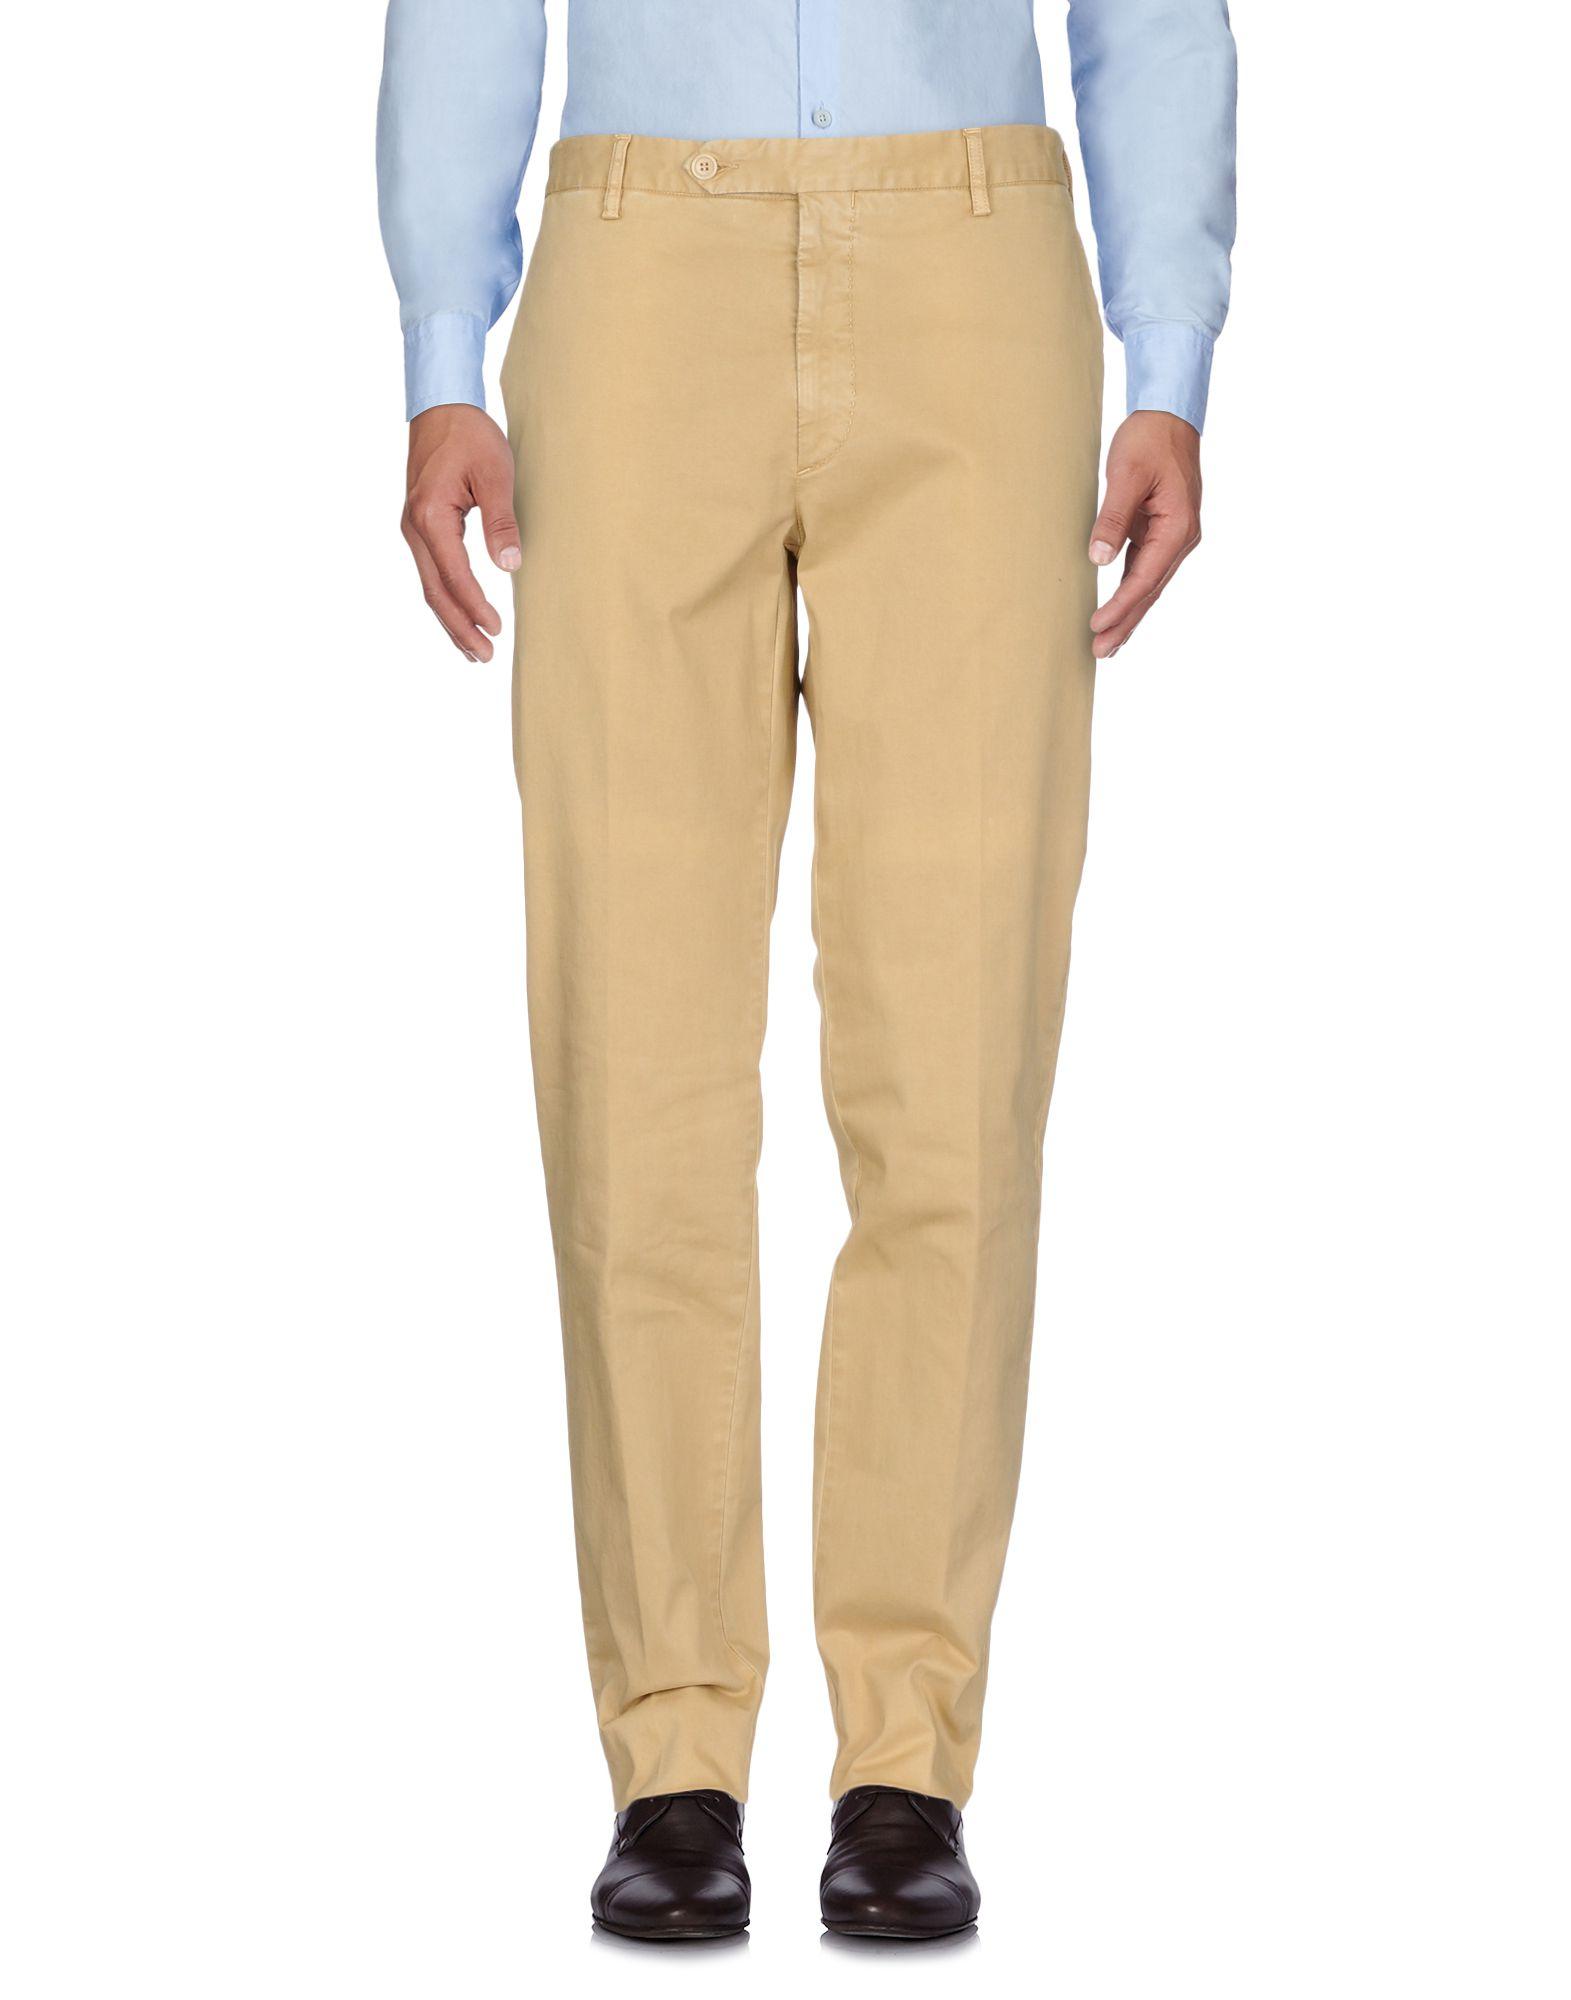 Pantalone Rotasport Donna - Acquista online su